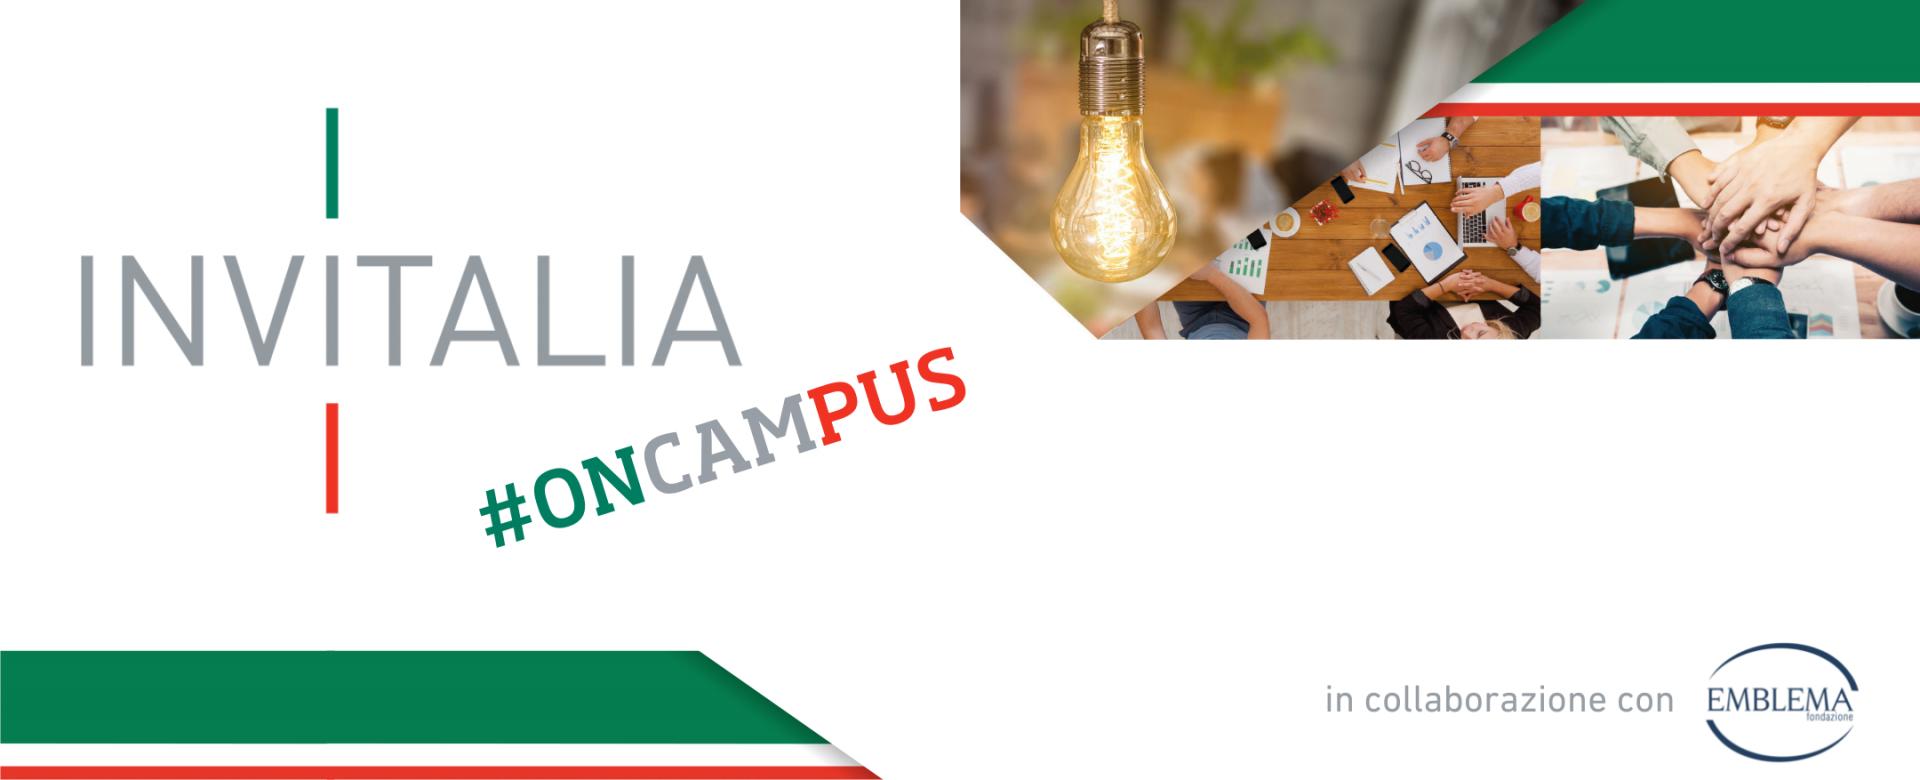 15.09.2021 - Invitalia #oncampus   II ciclo